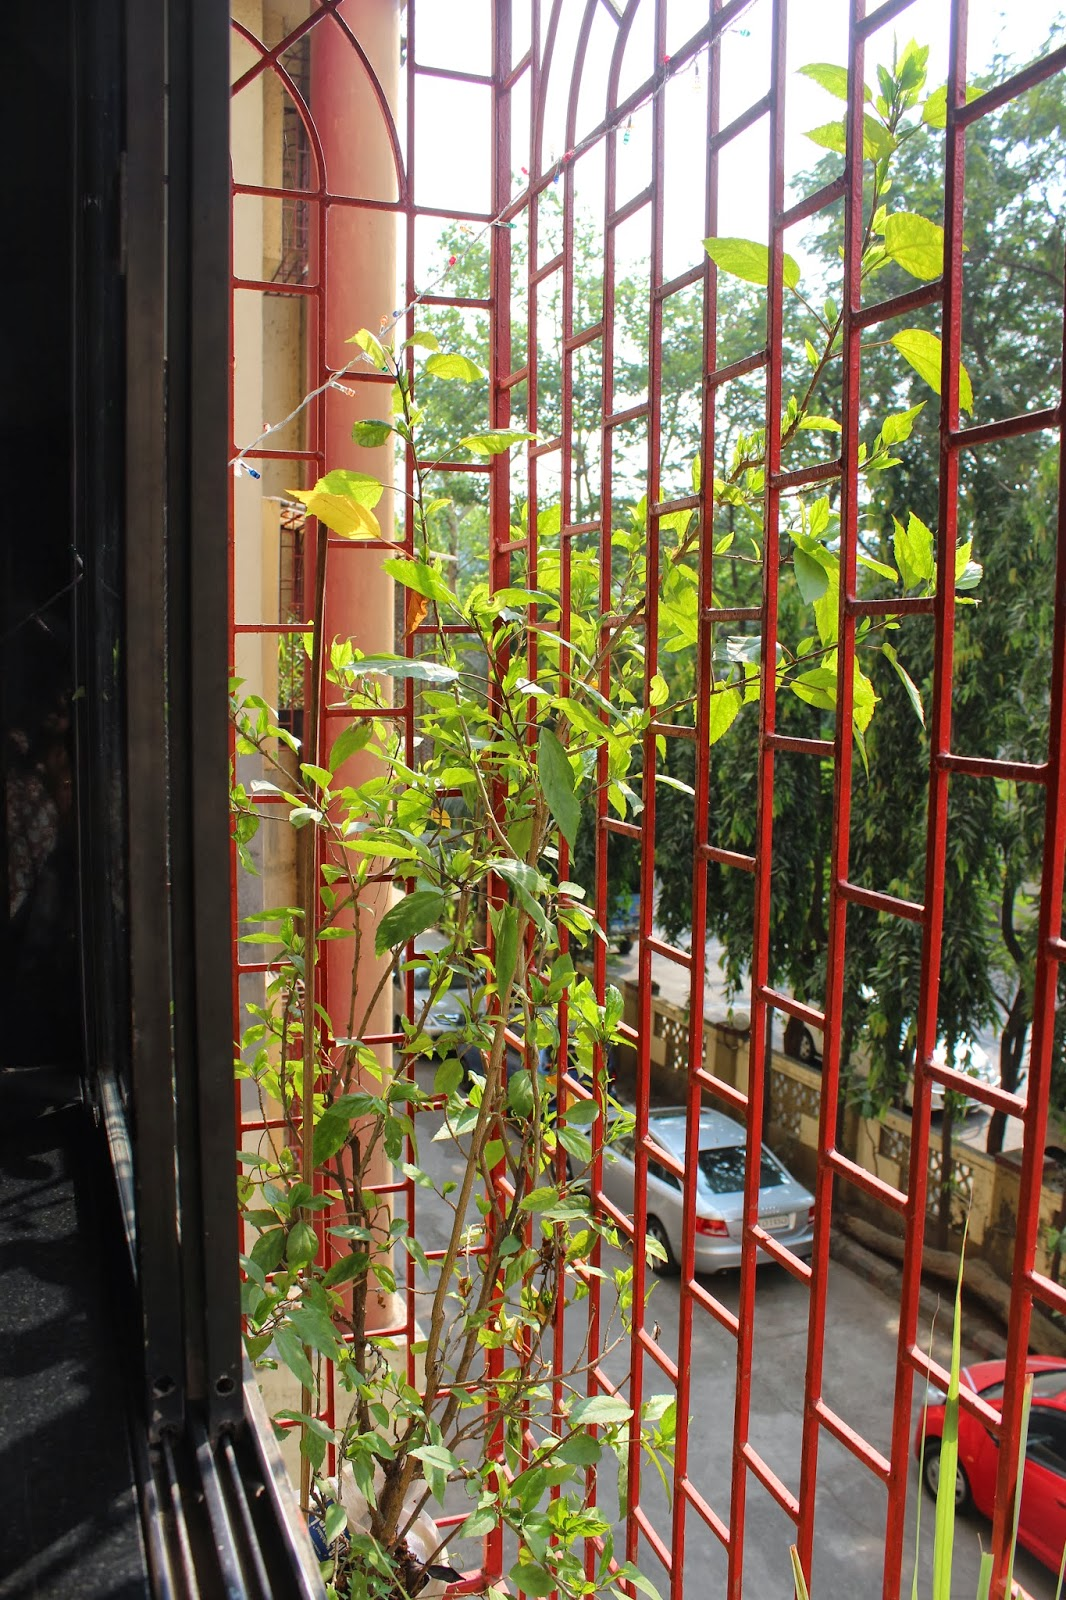 Balcony Window Grill Design: AnnaParabrahma: The Green Balcony Is Back As The Window